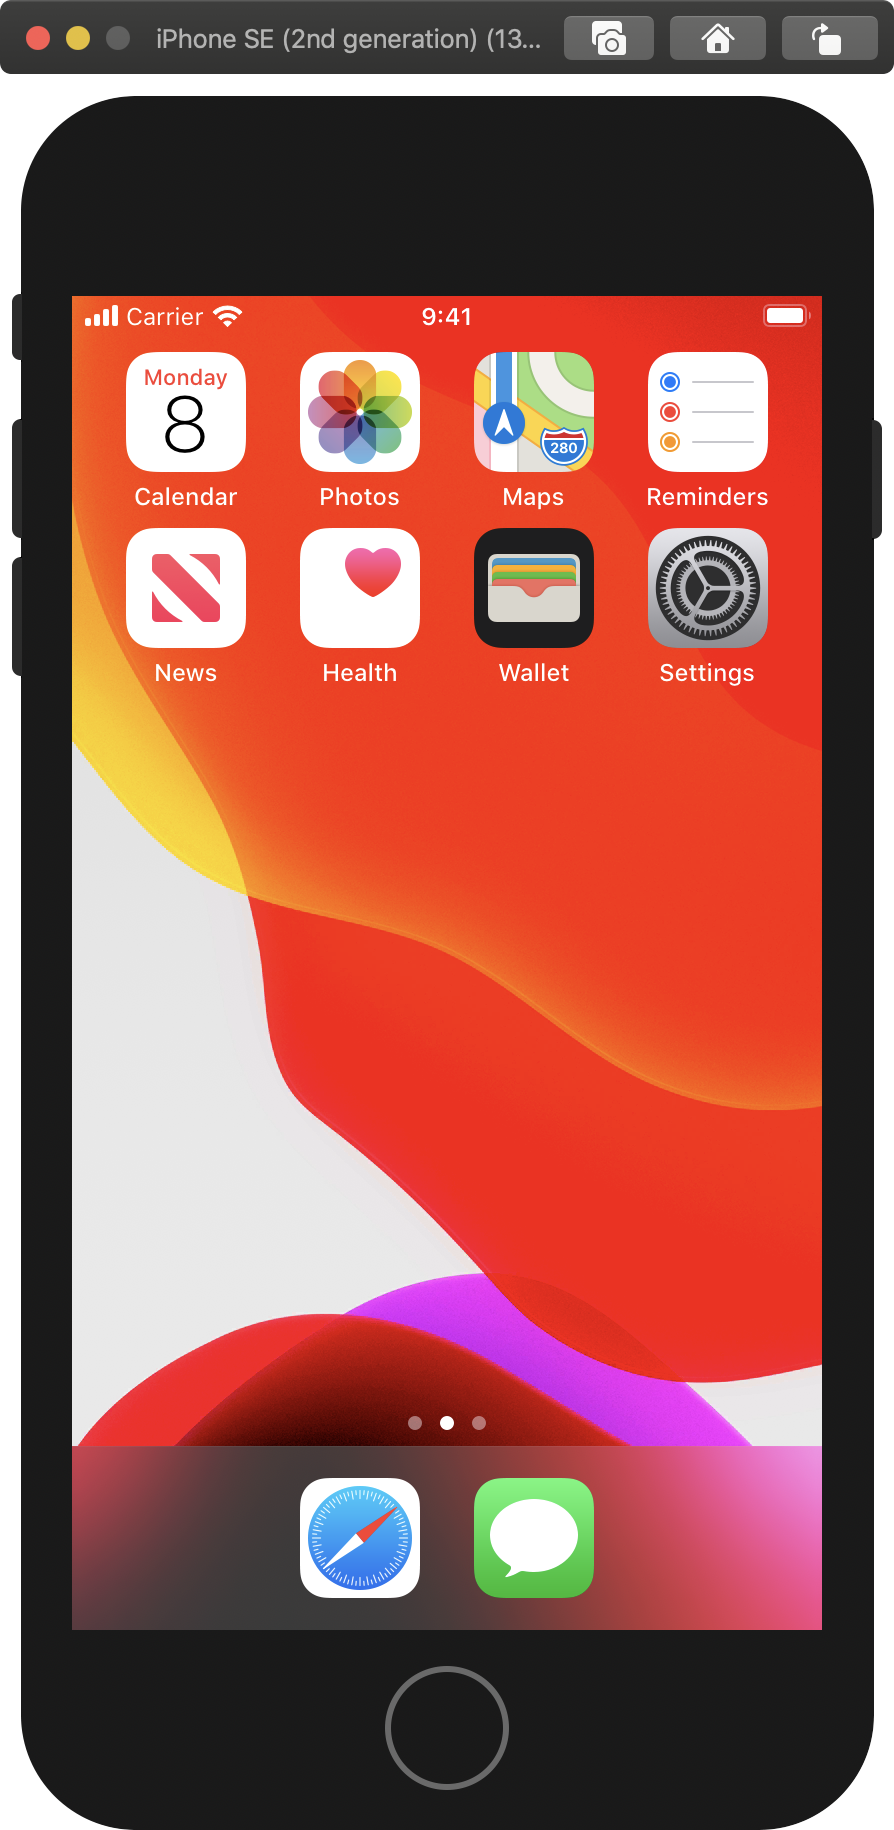 The iPhone SE home screen in Simulator